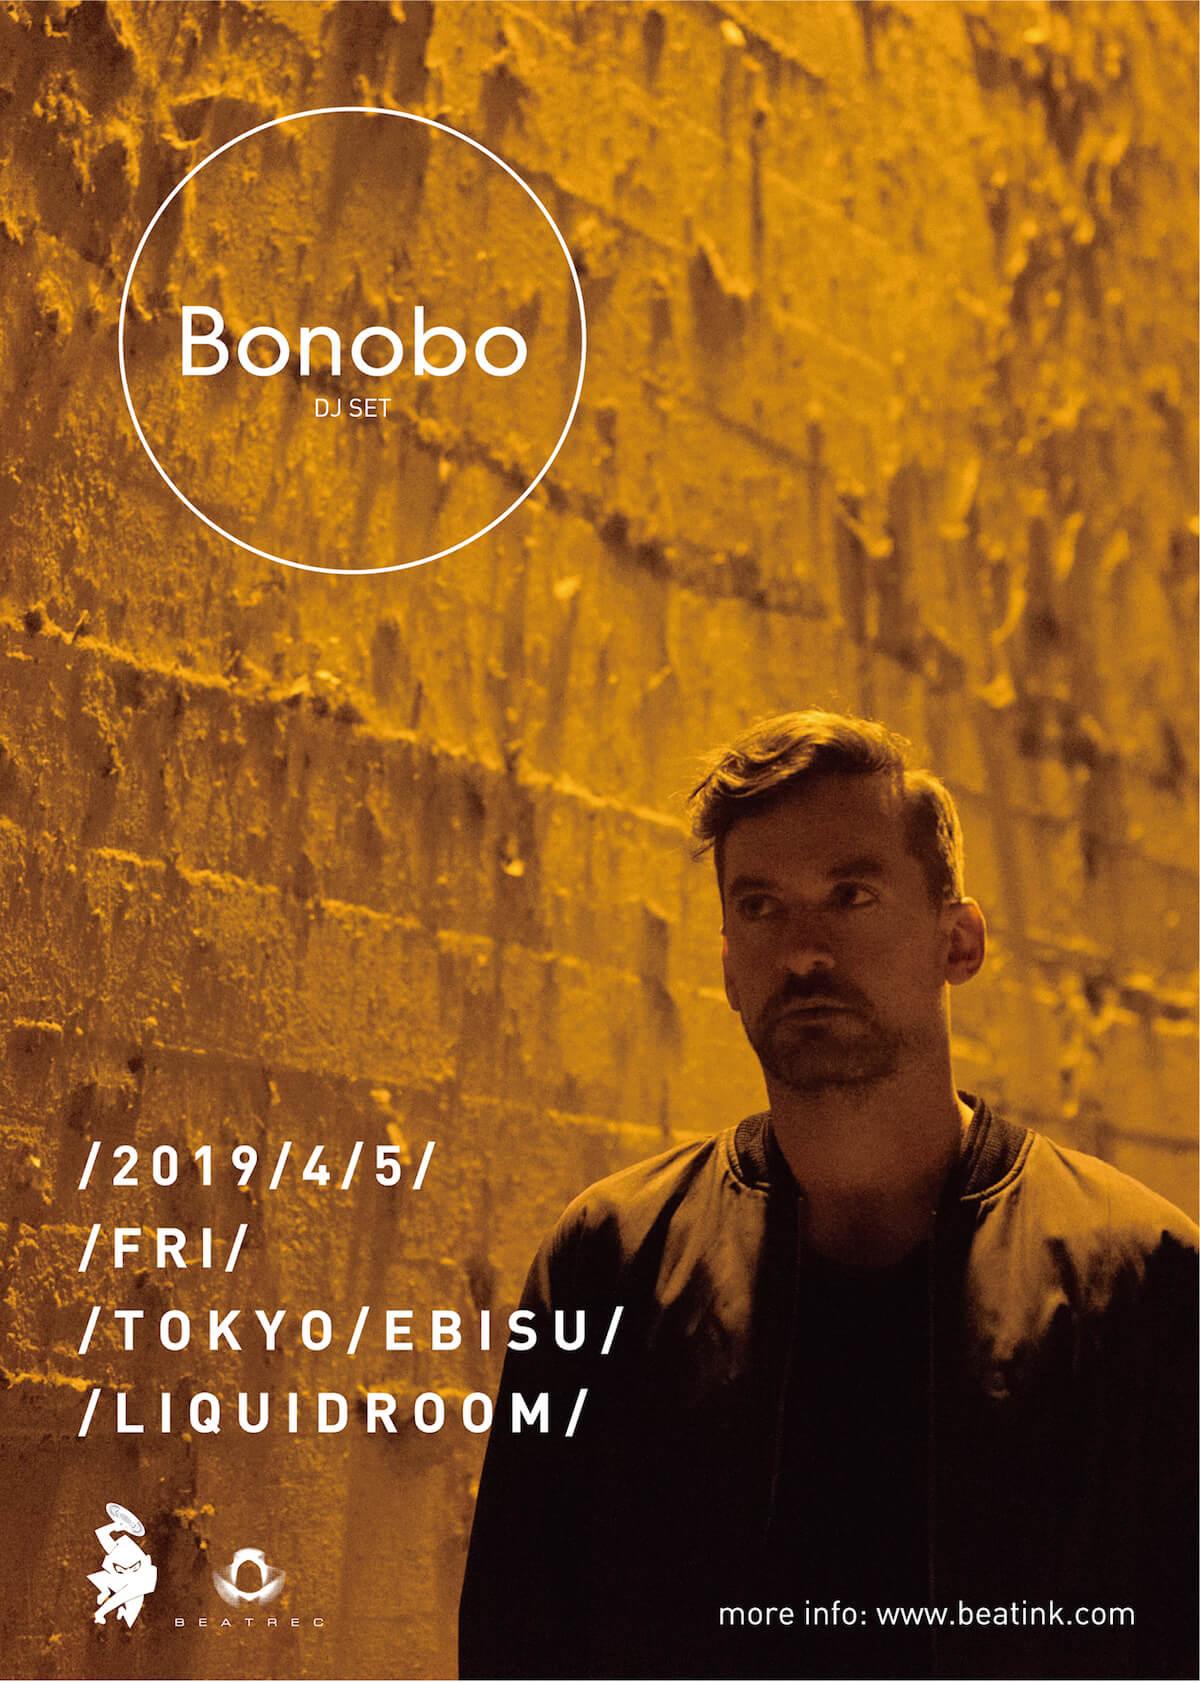 BonoboのDJセットが4月にLIQUIDROOMで急遽開催決定 music190215-bonobo